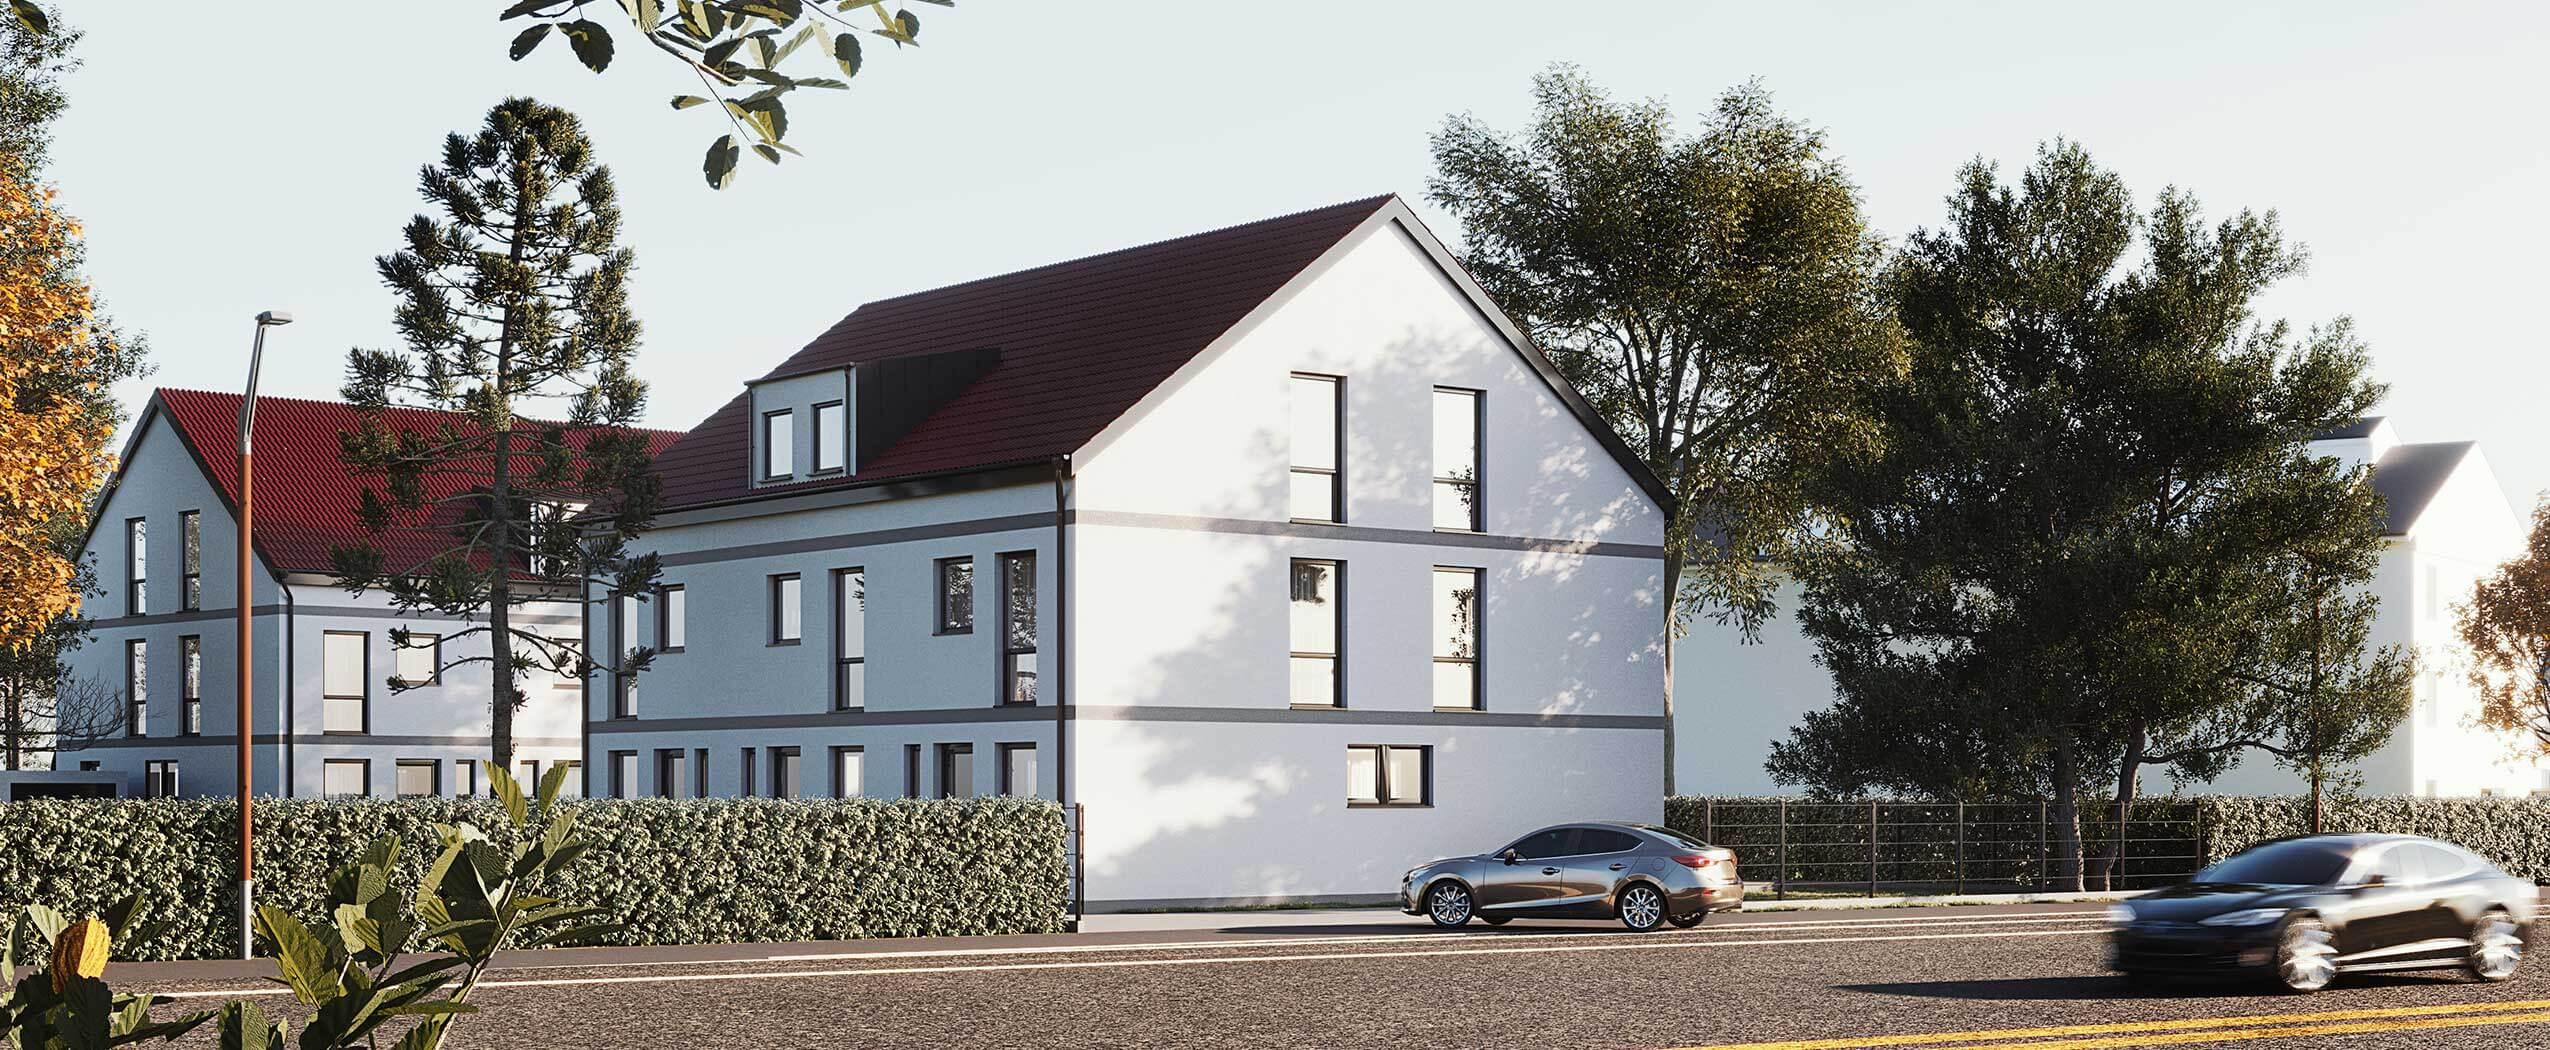 DOMUS Townhouse Königsbrunn DOMUS Regioimmobilien